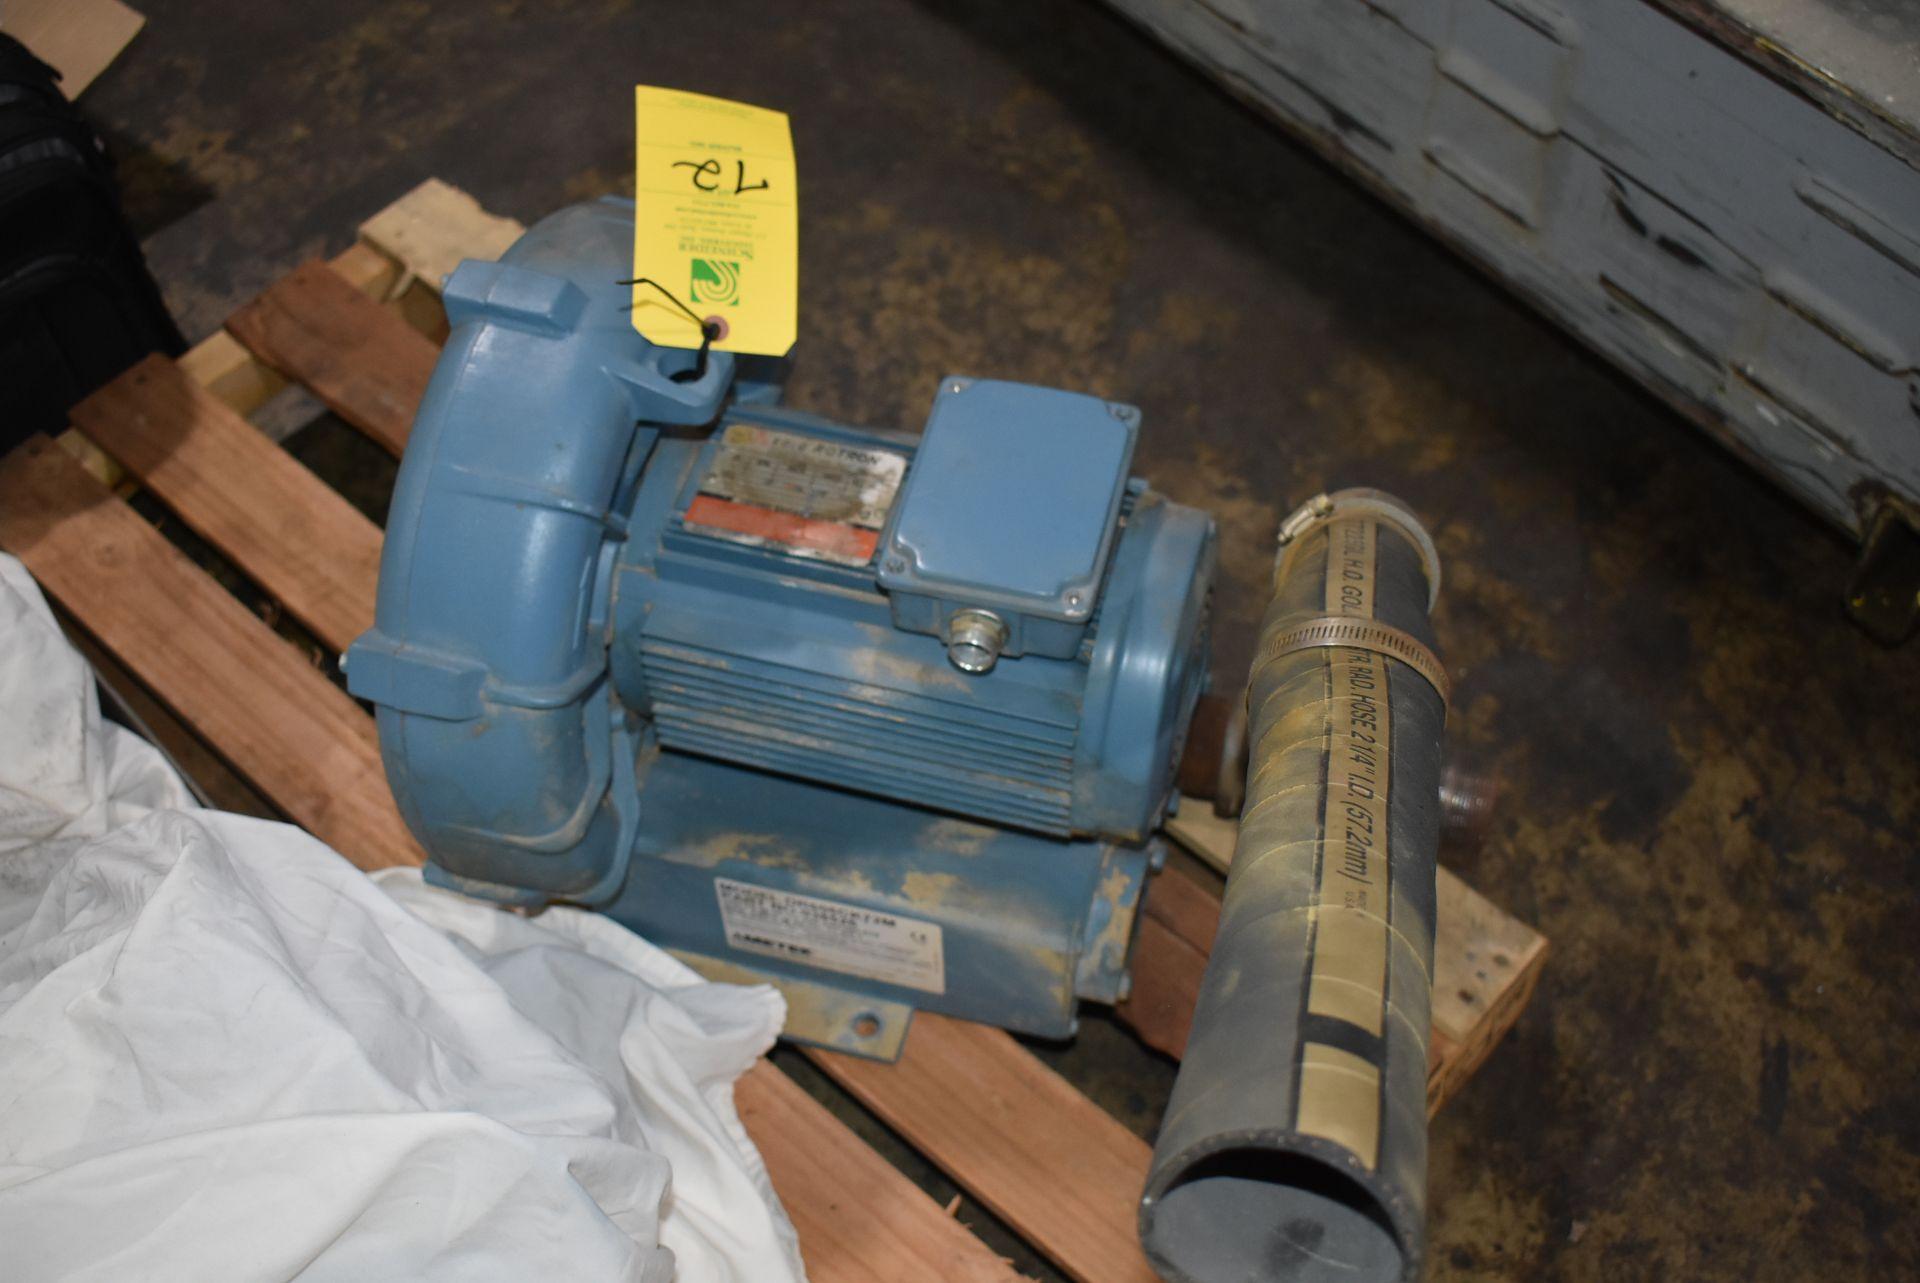 Ametek EG Rotron Model #DR606CK72M Blower w/Motor - Image 3 of 3